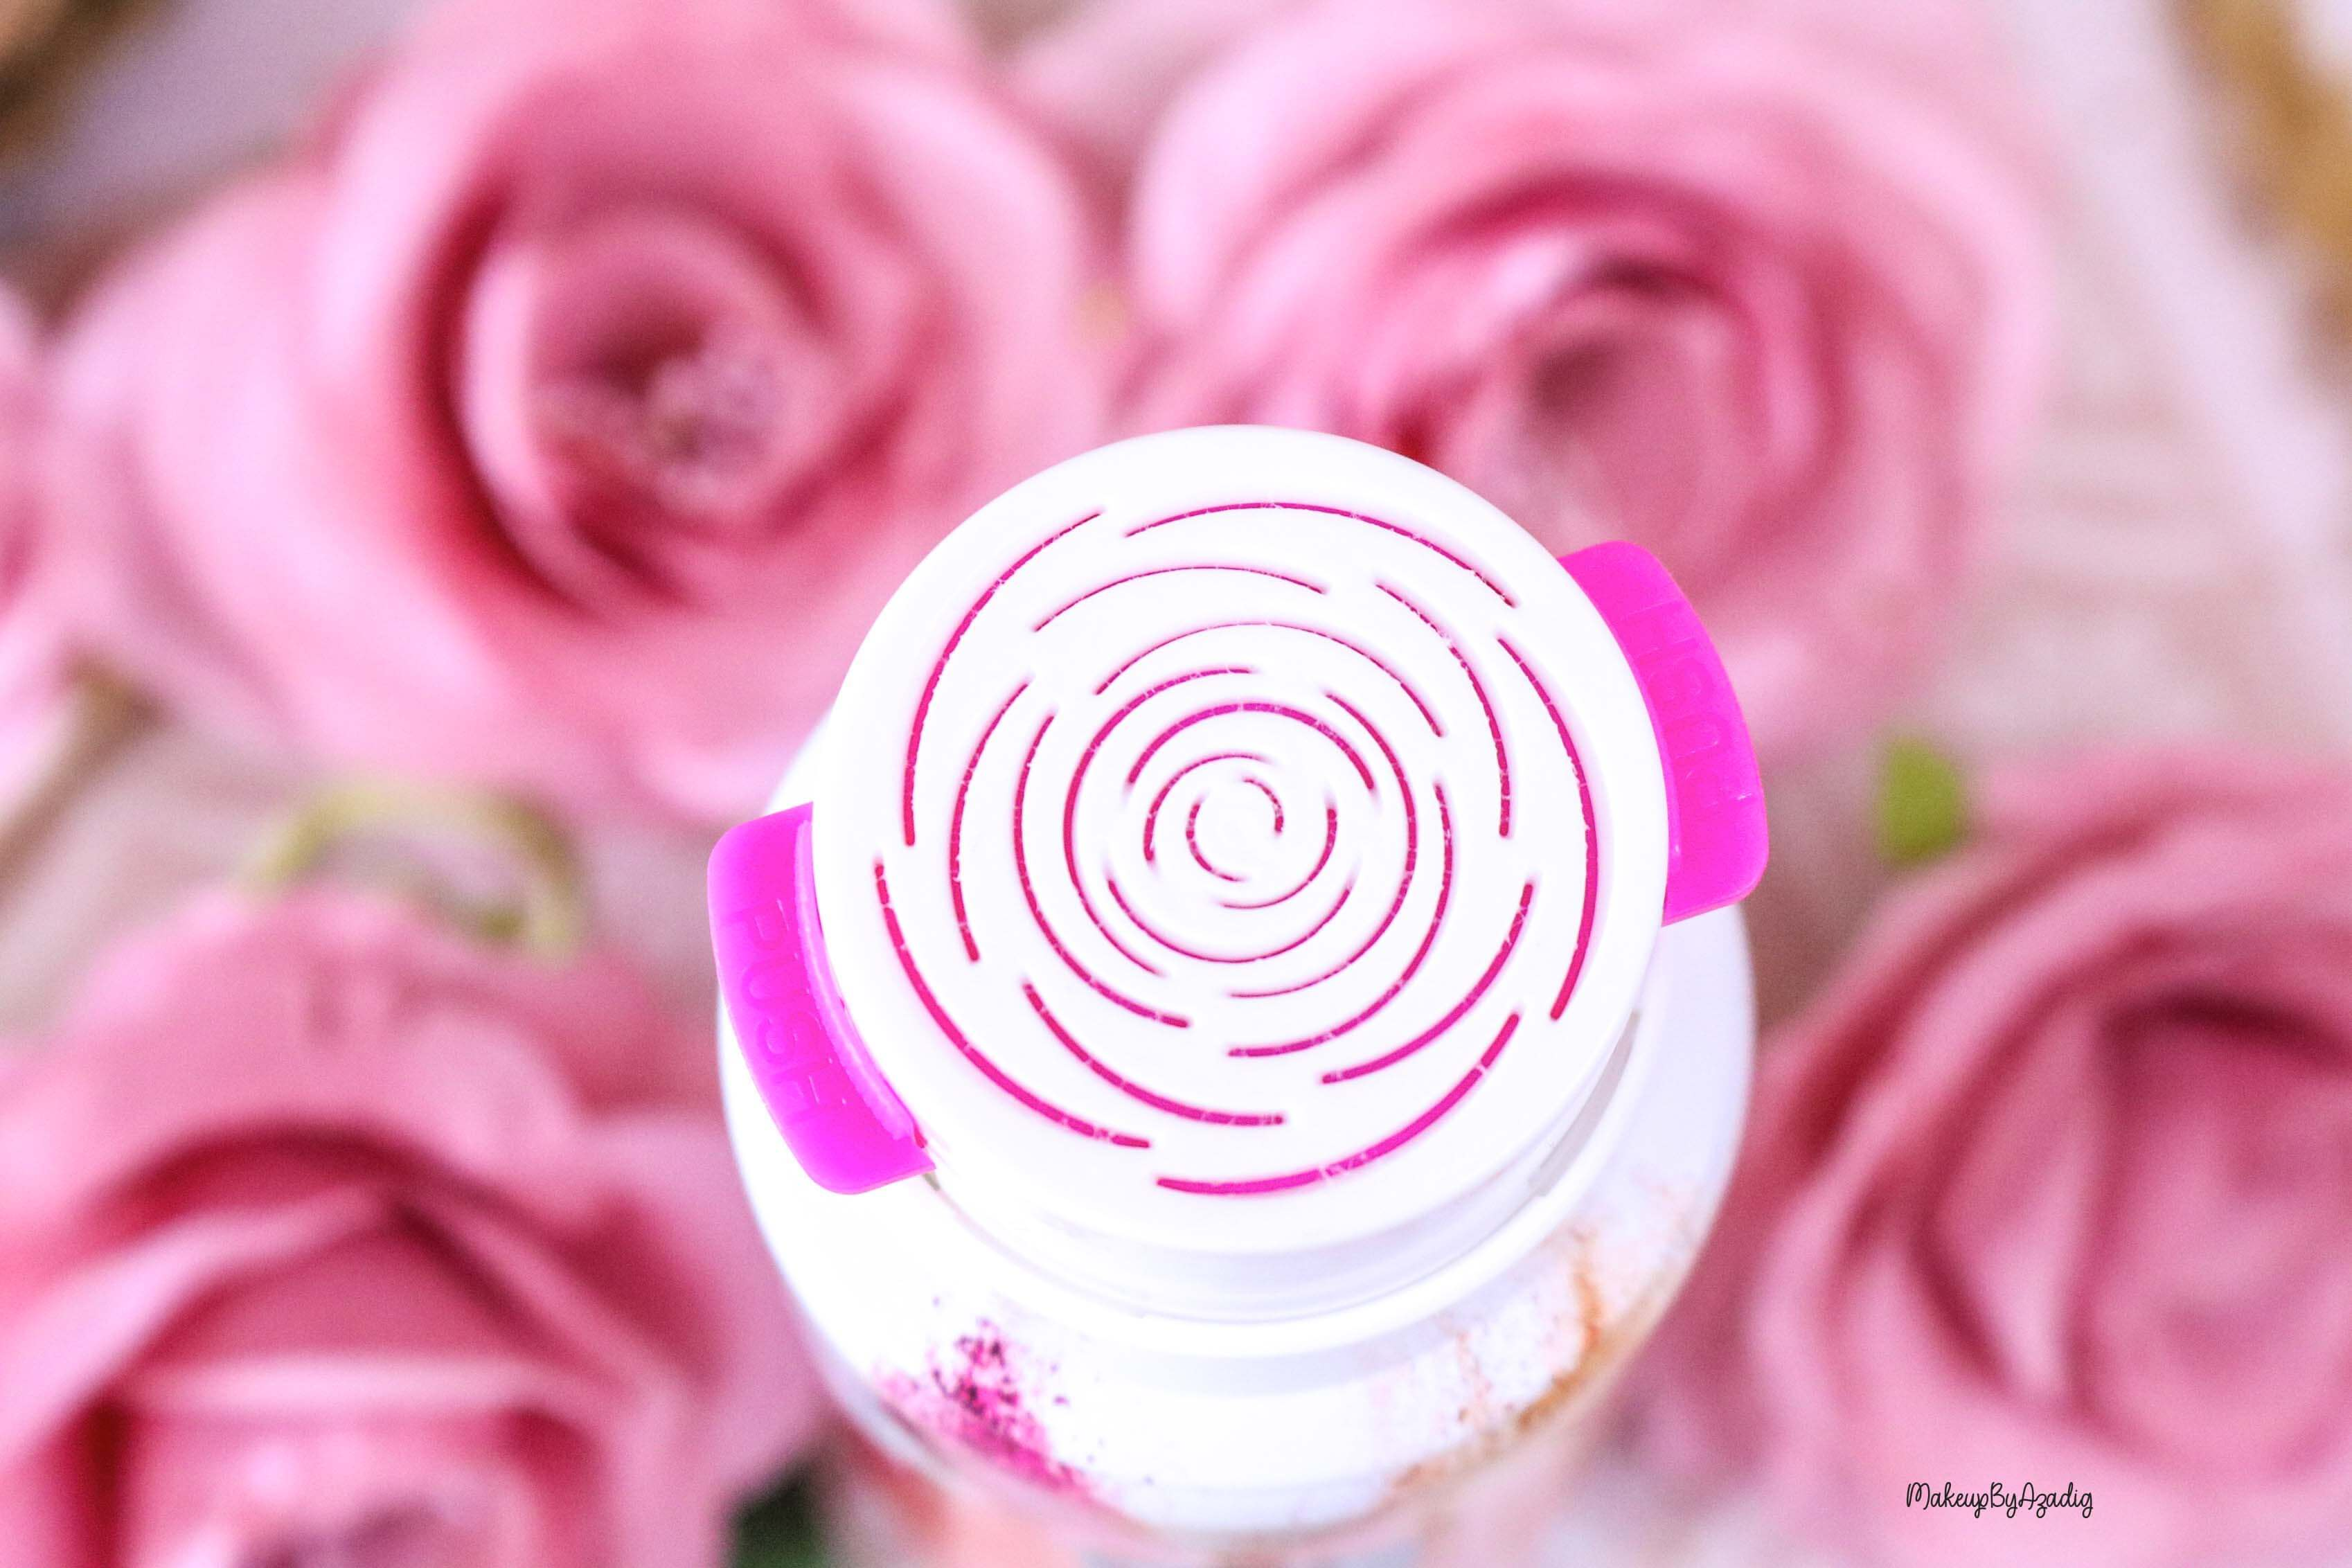 gel-douche-mousse-rituals-shower-flower-foam-ritual-hoi-makeupbyazadig-avis-prix-sephora-france-embout